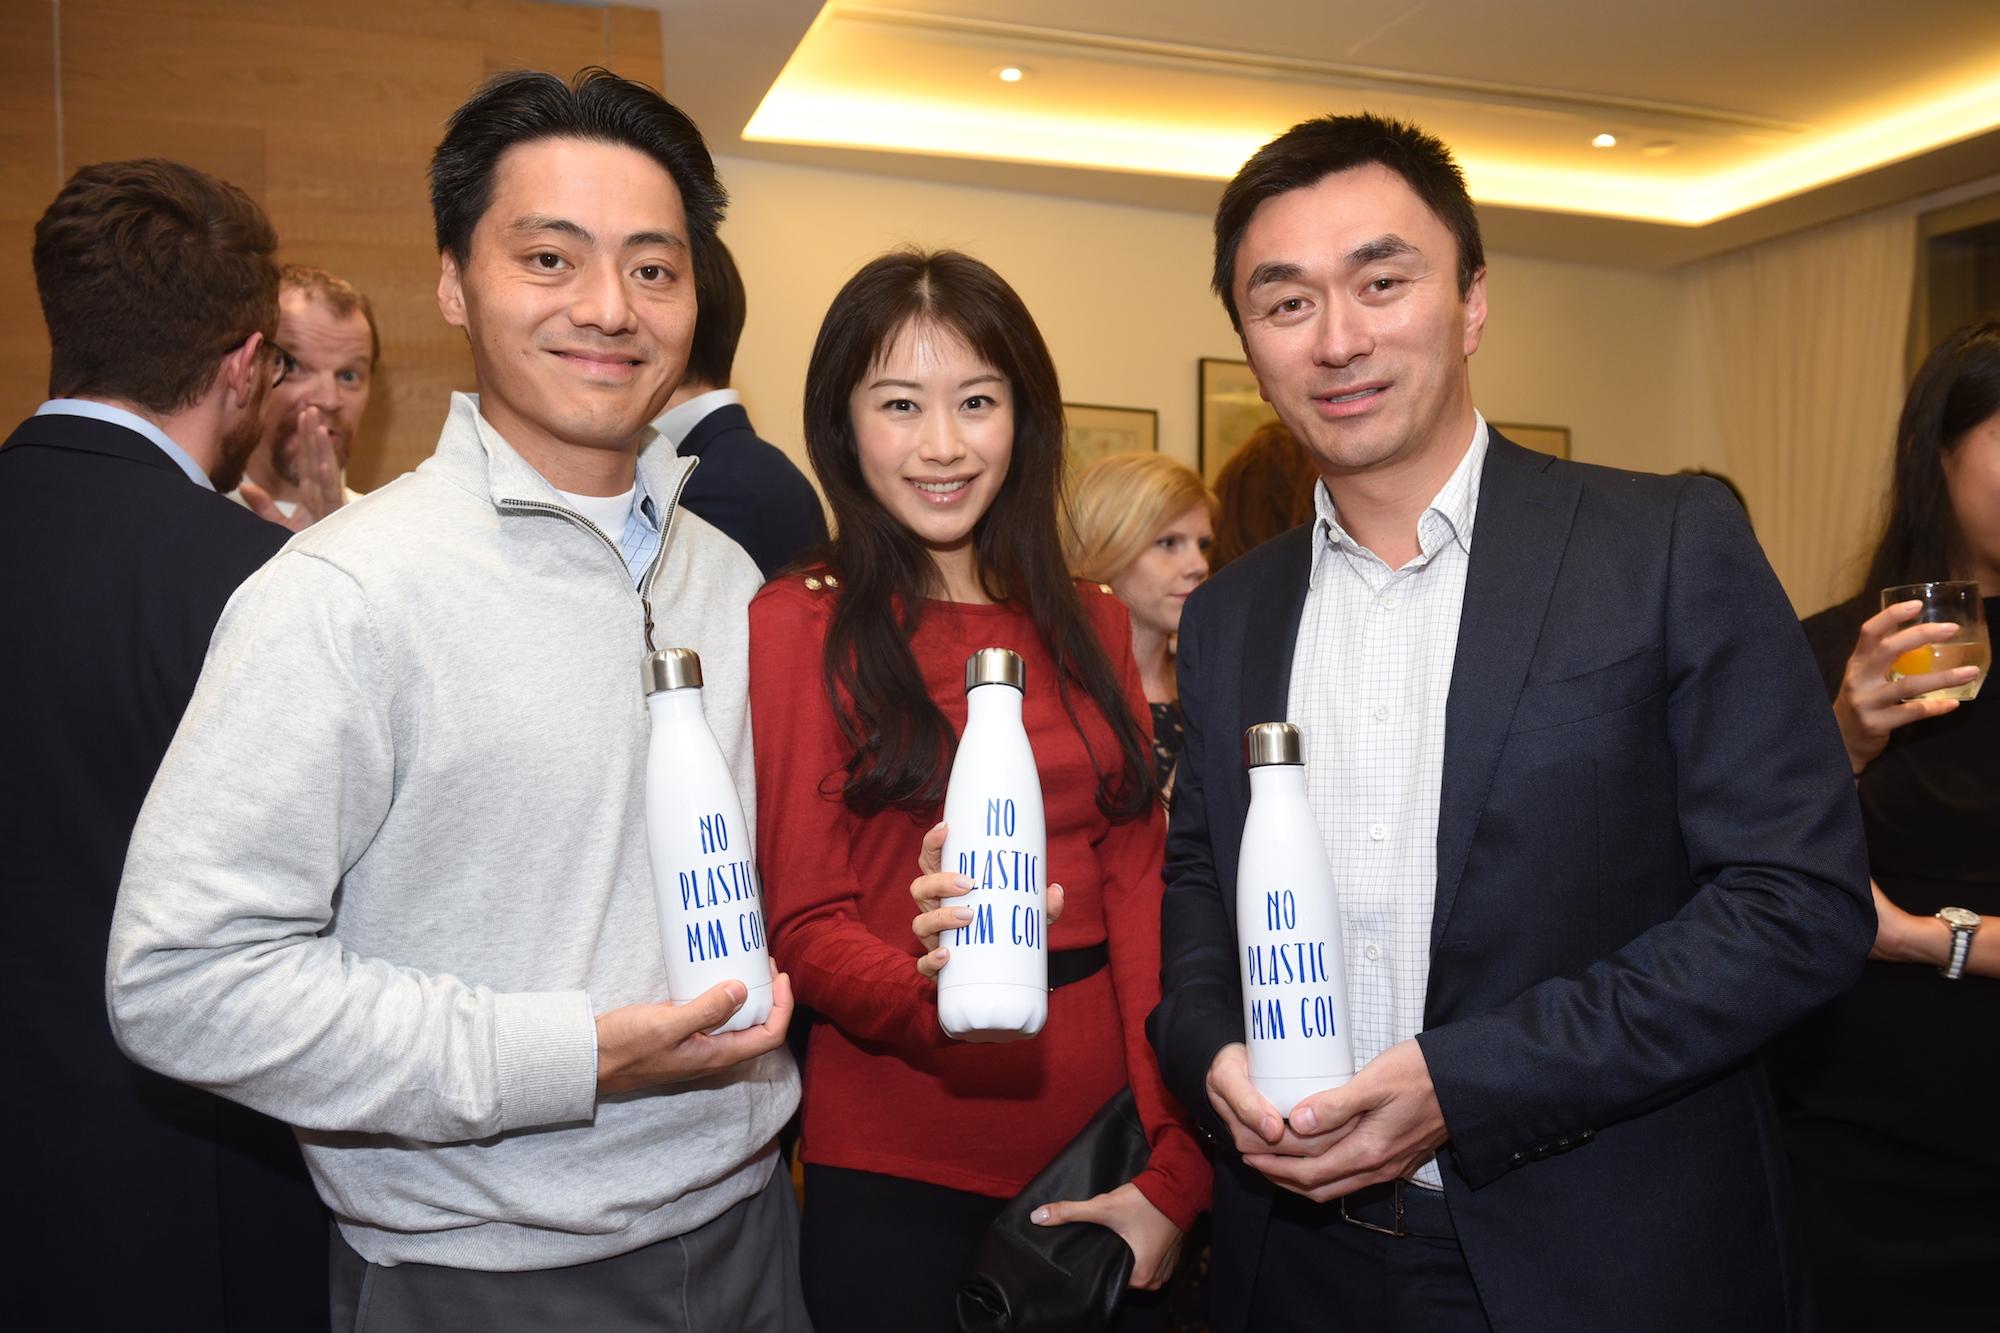 Oscar Chow, Alanna Chow, Patrick Wong